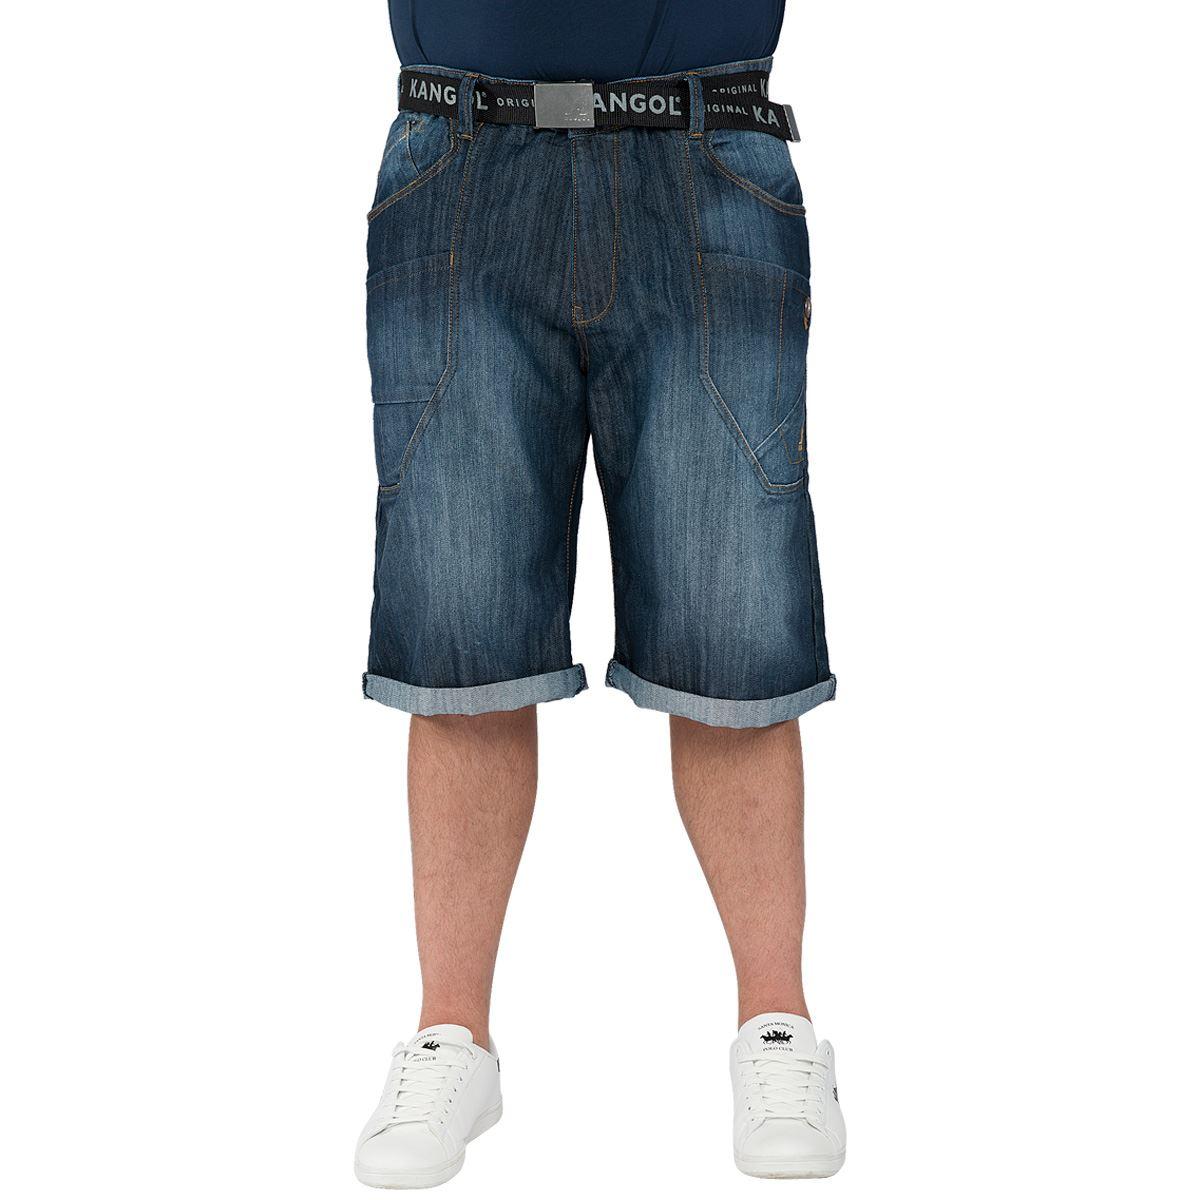 Braga % Merino Wool V-Neck Men's Sweaters in Charcoal Grey - Short Man Sizes ($) $ $ Modena Short Man Cotton Blend Dress Shirts in Powder Blue - Short Man Sizes .